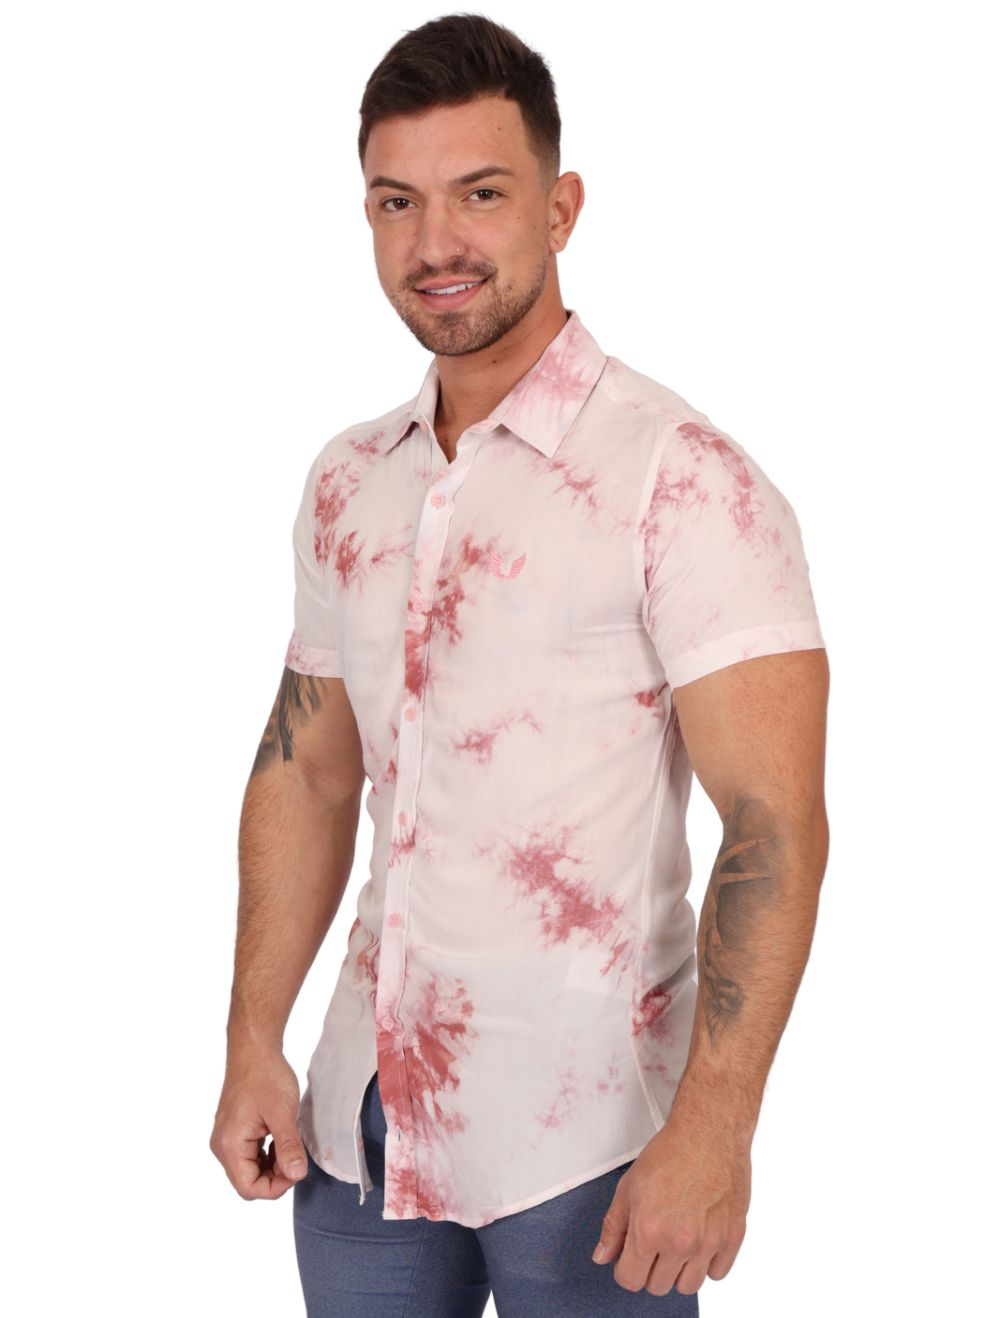 Camisa Masculina Manga Curta Slim Tie Dye Rosa Salmão